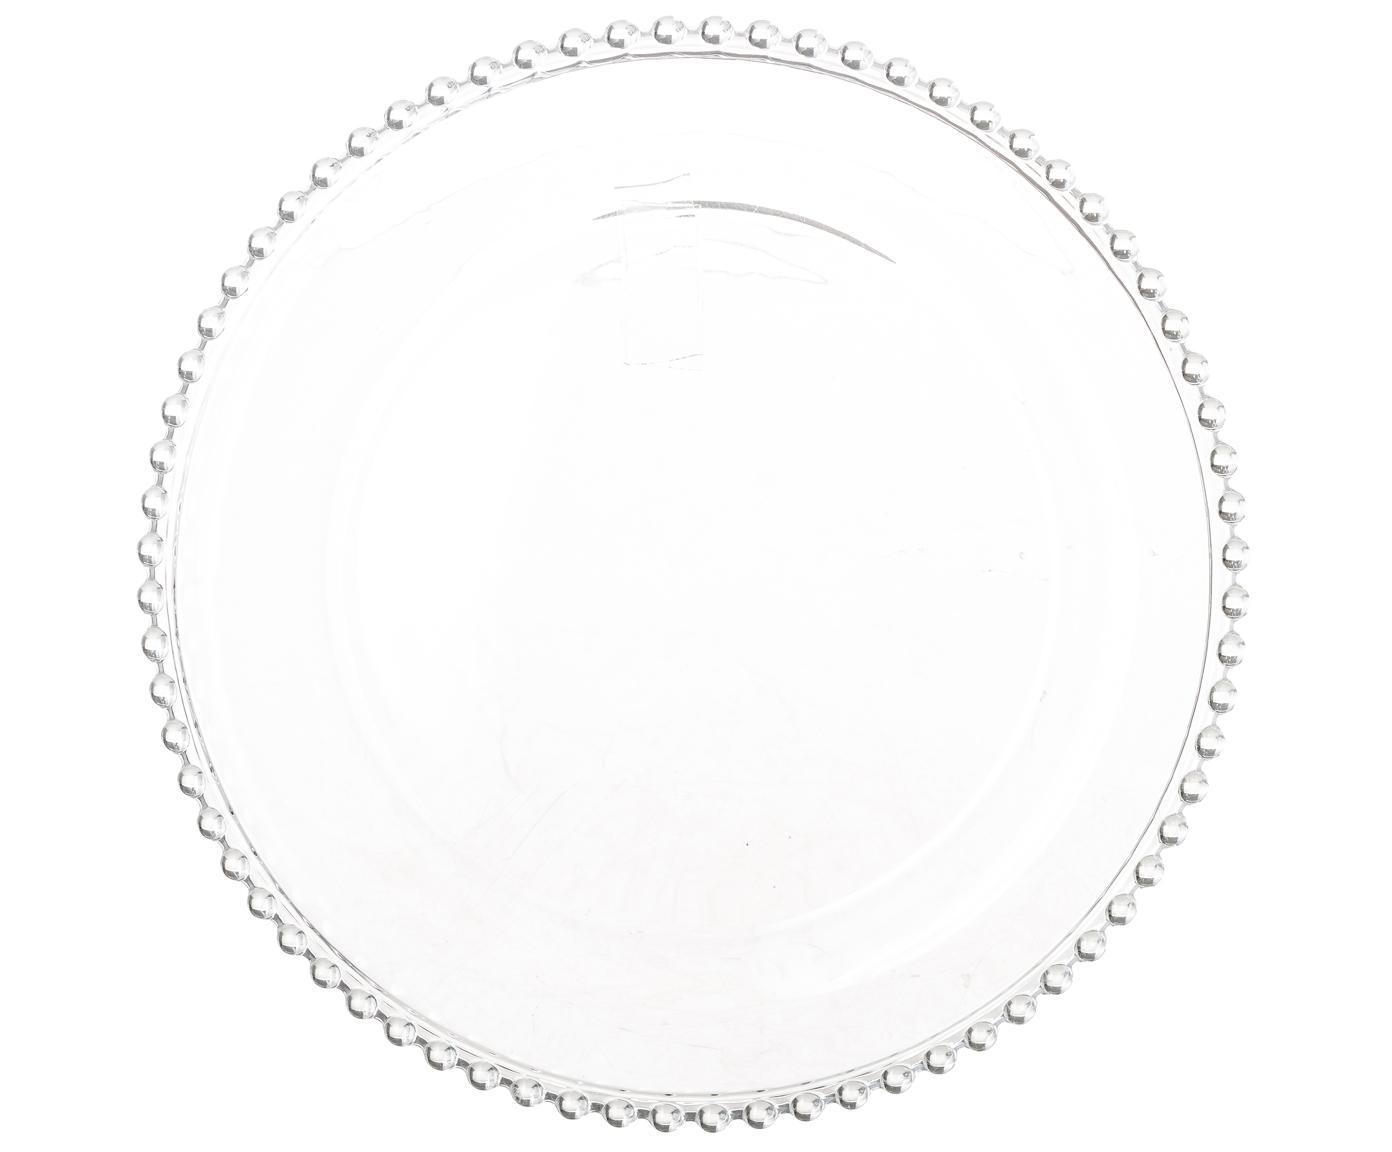 Glas-Speiseteller Perles, 2 Stück, Glas, Transparent, Ø 27 cm